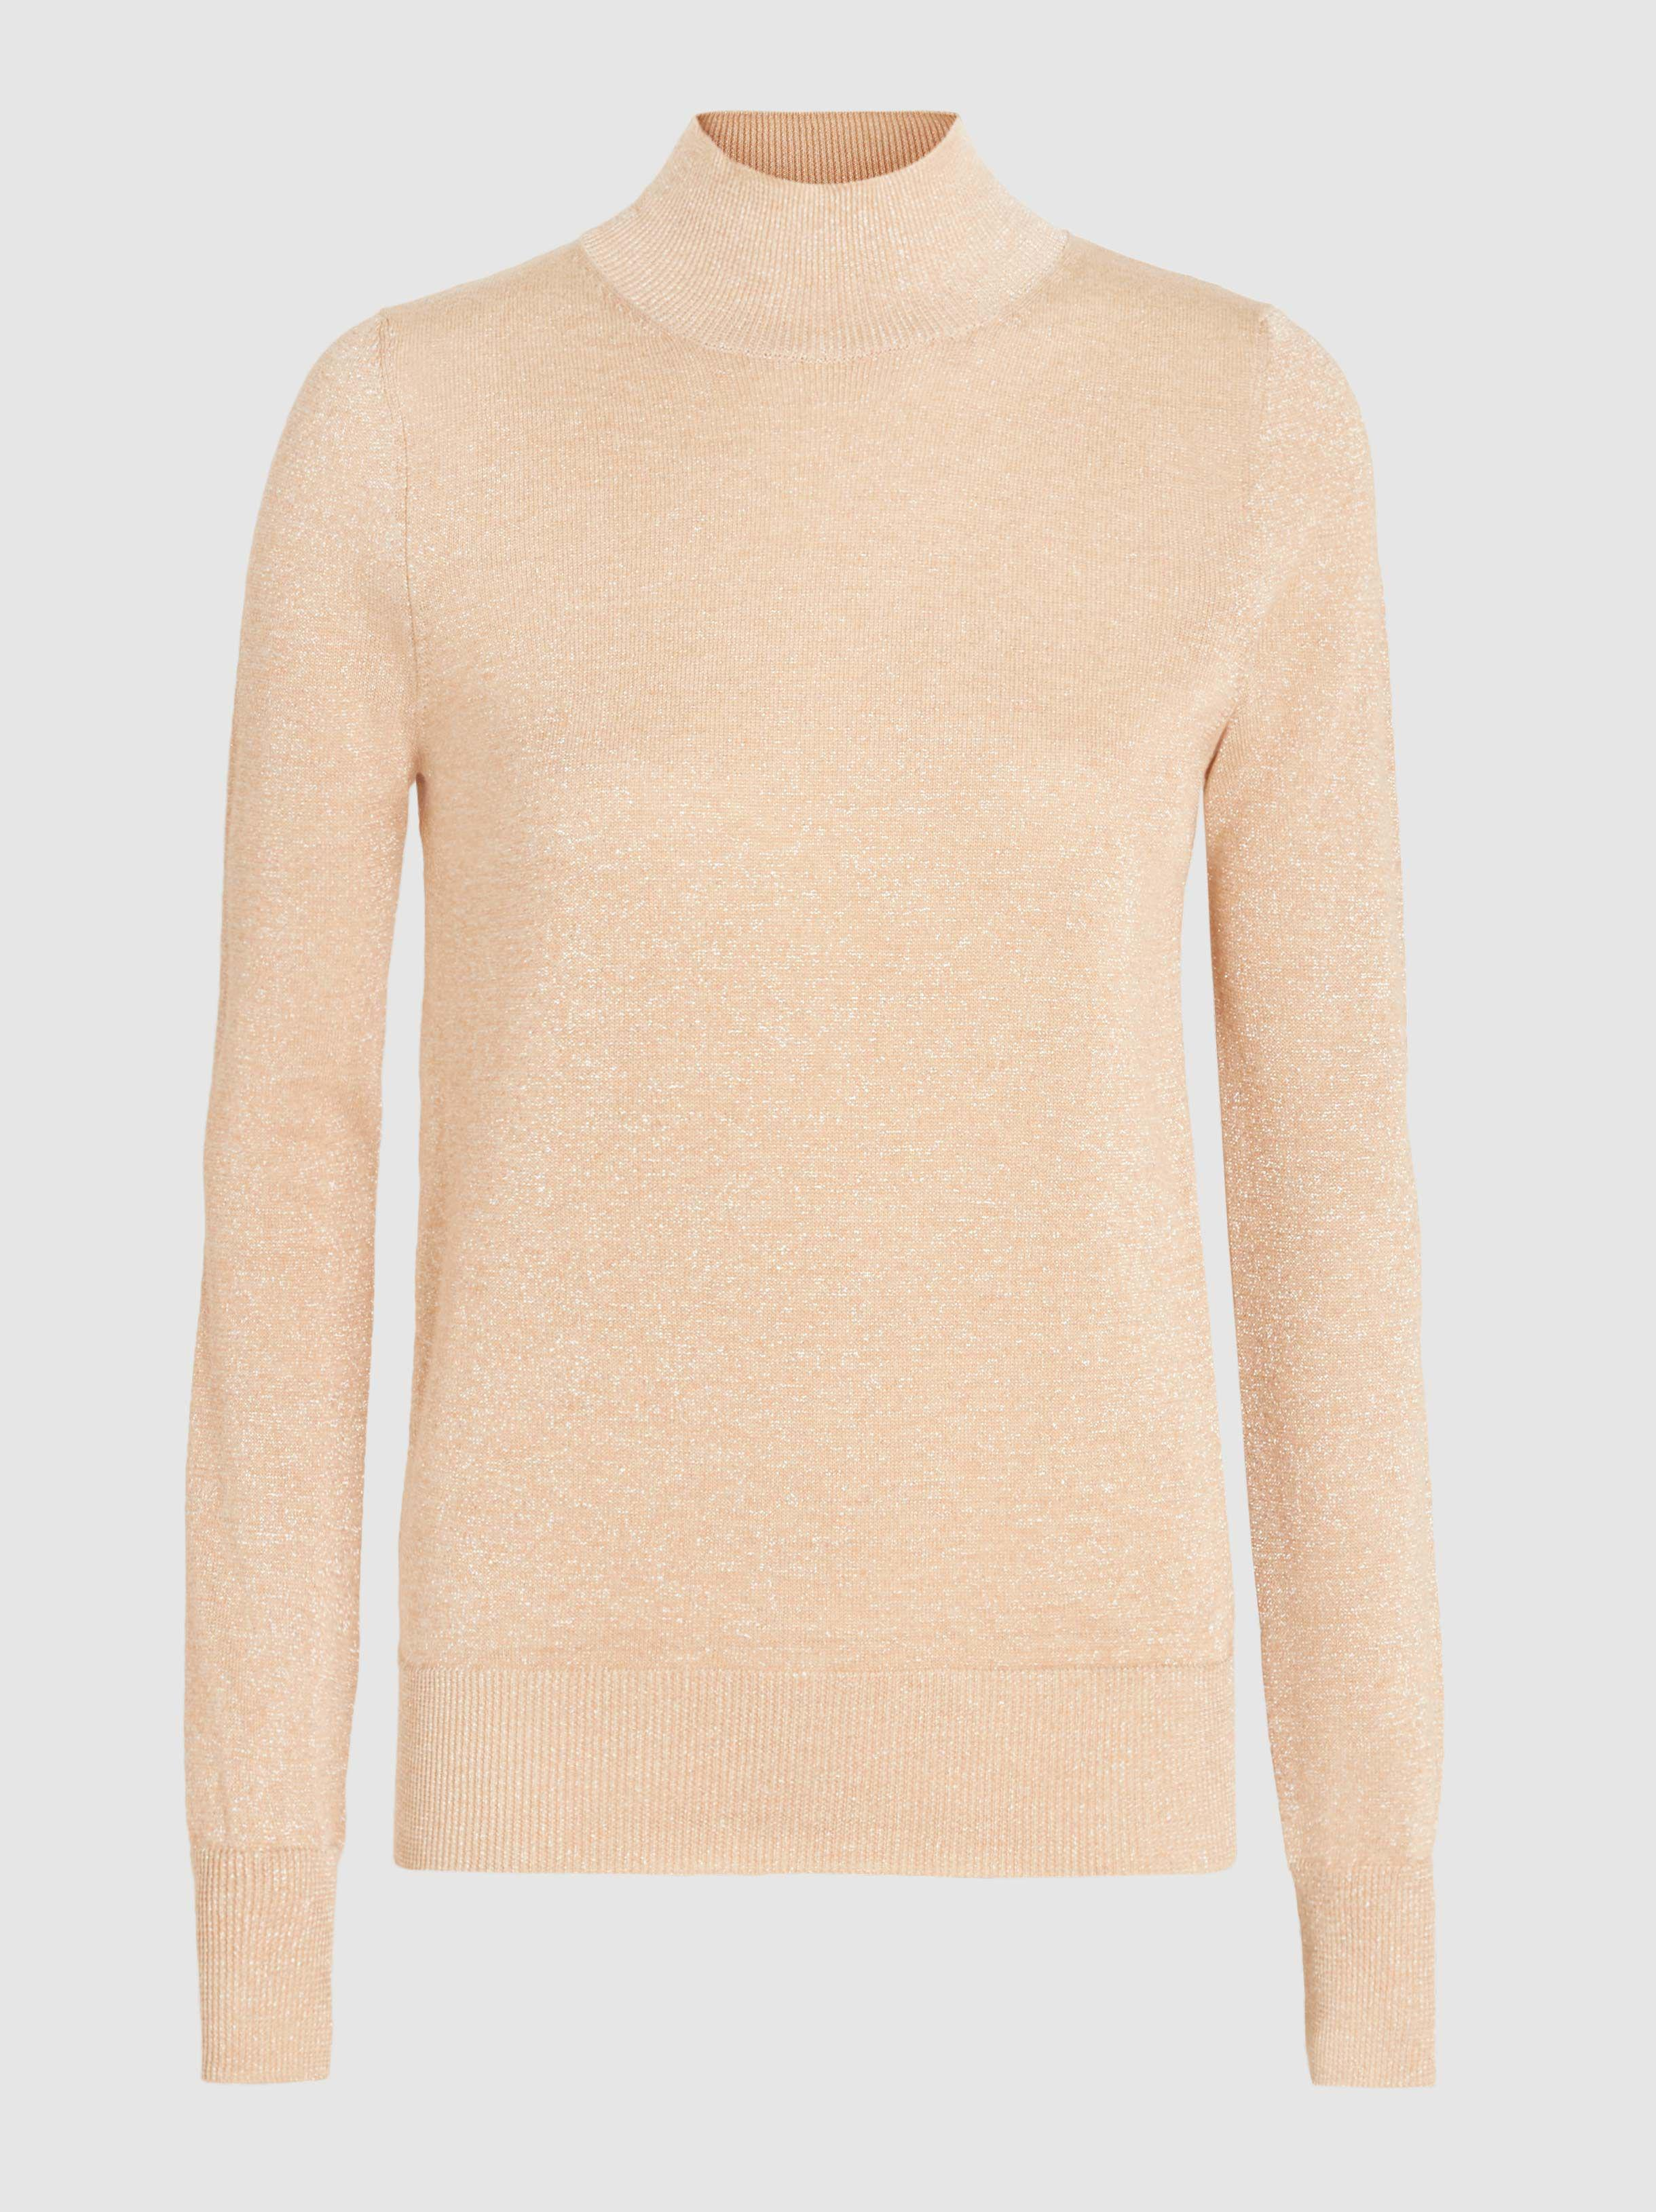 Stucco Metallic Fine-Knit Turtleneck Sweater Joseph Footaction Online New Arrival LK2ZO2q